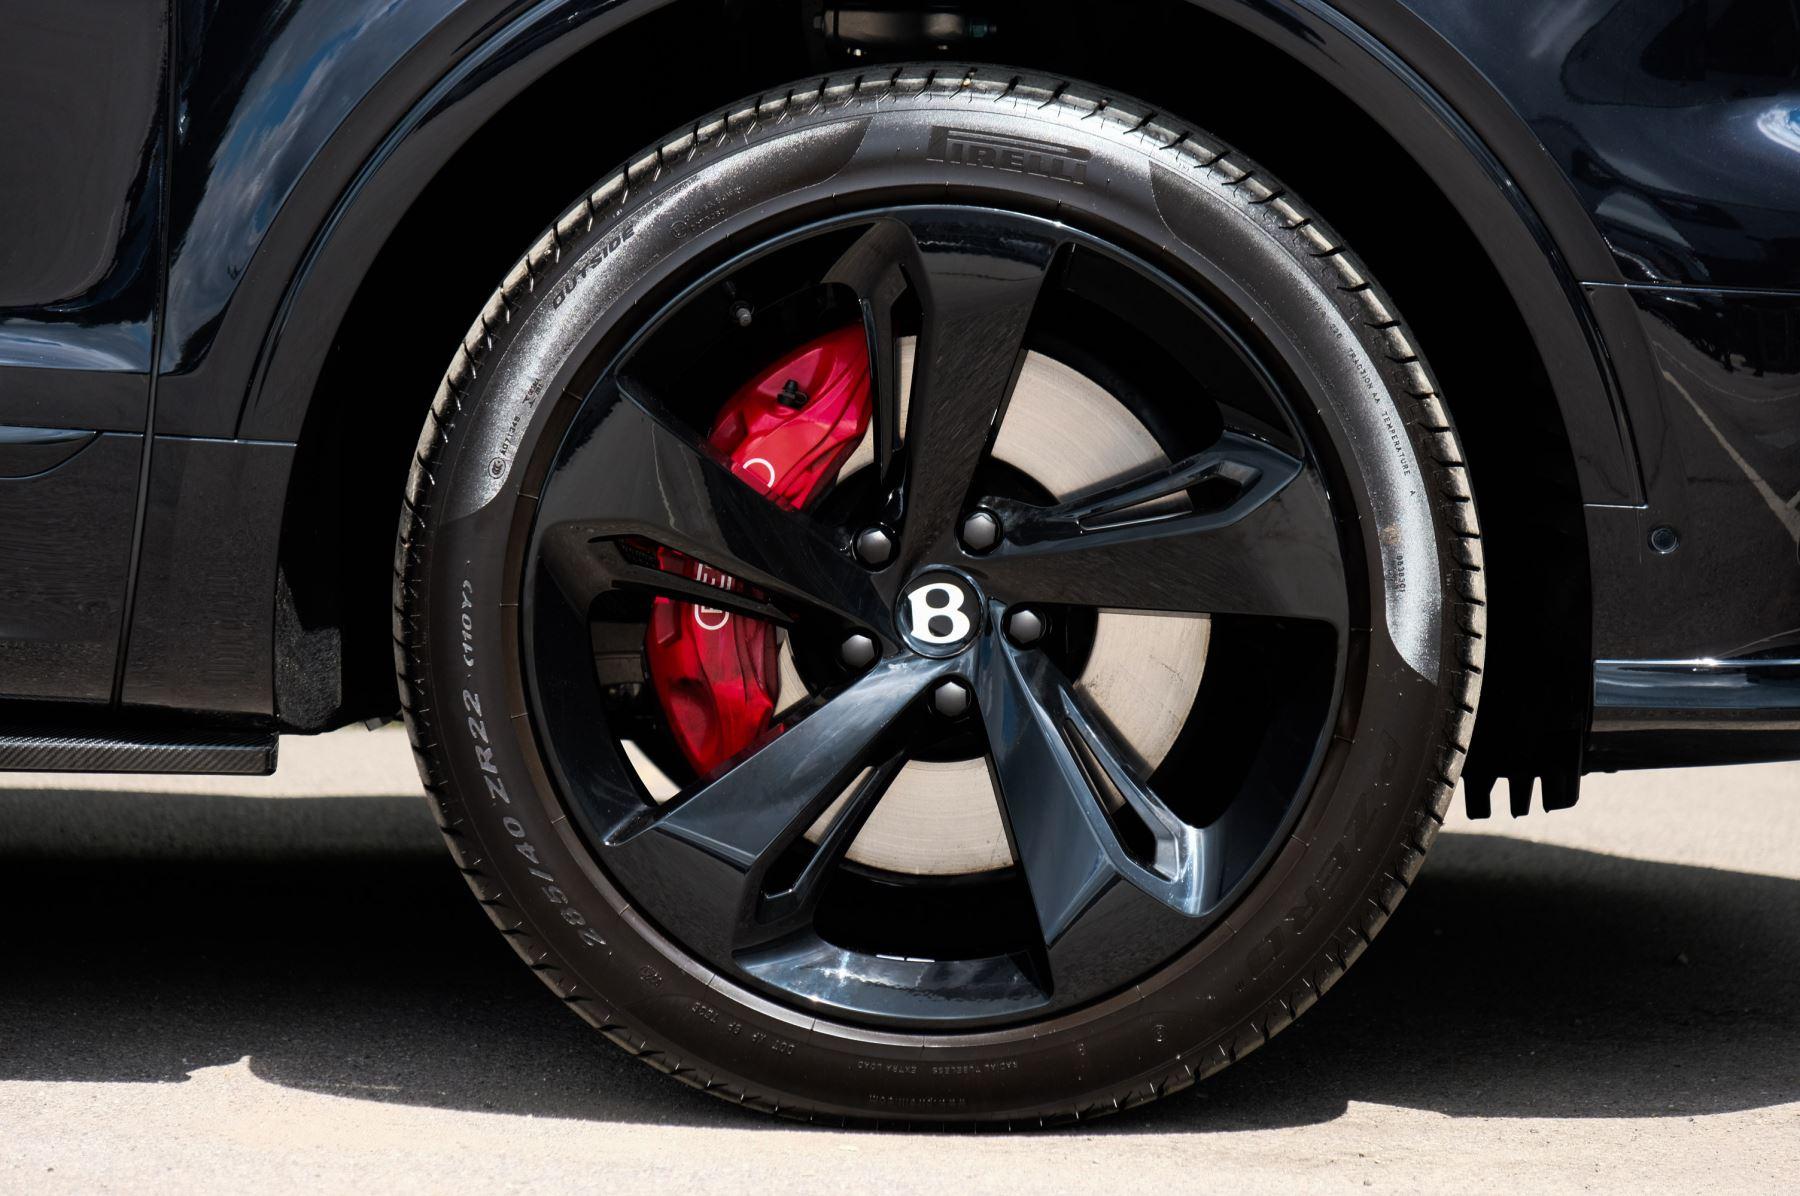 Bentley Bentayga 4.0 V8 - Mulliner Driving Specification for Black Specification image 7